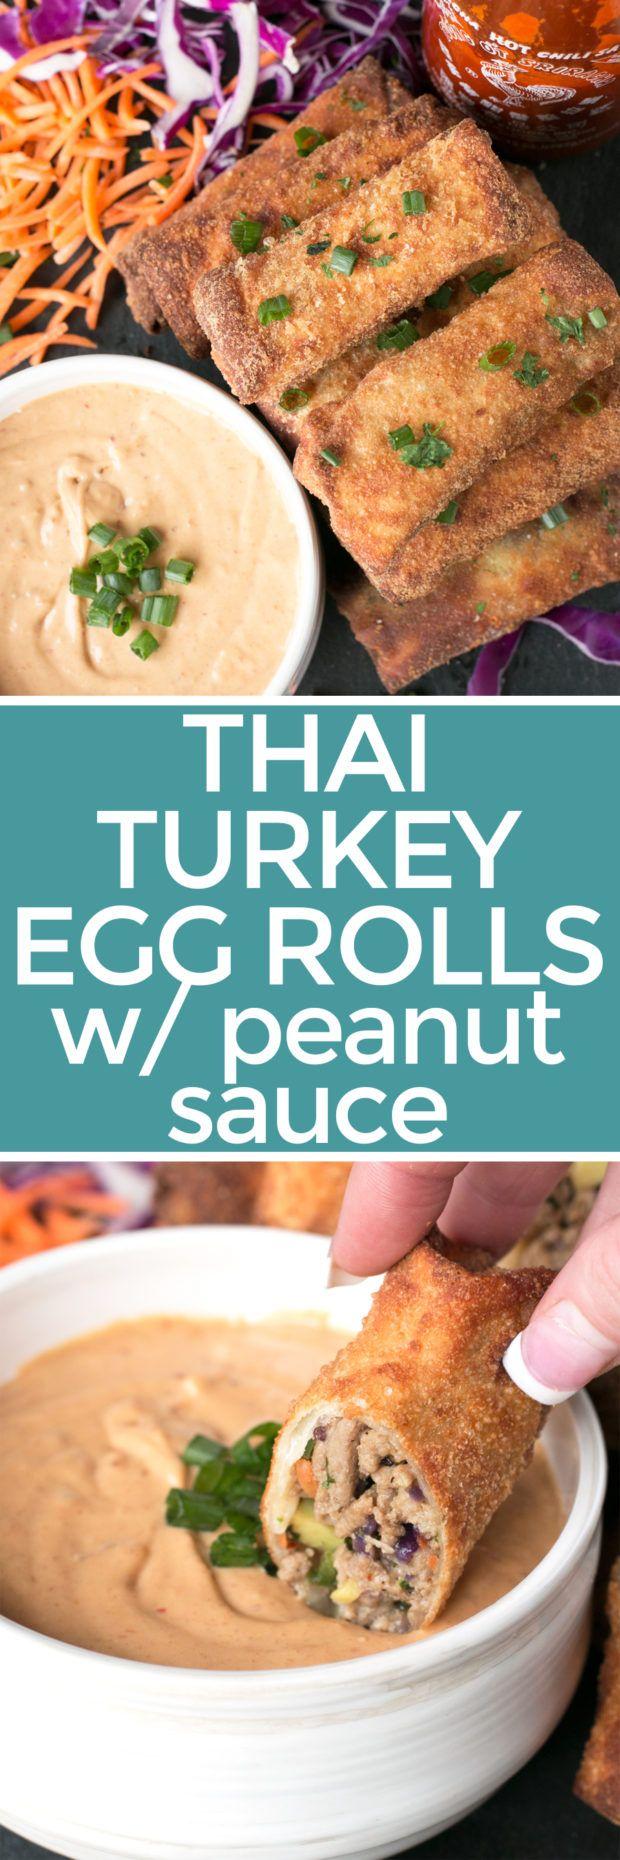 Thai Turkey Avocado Egg Rolls – Cake 'n Knife